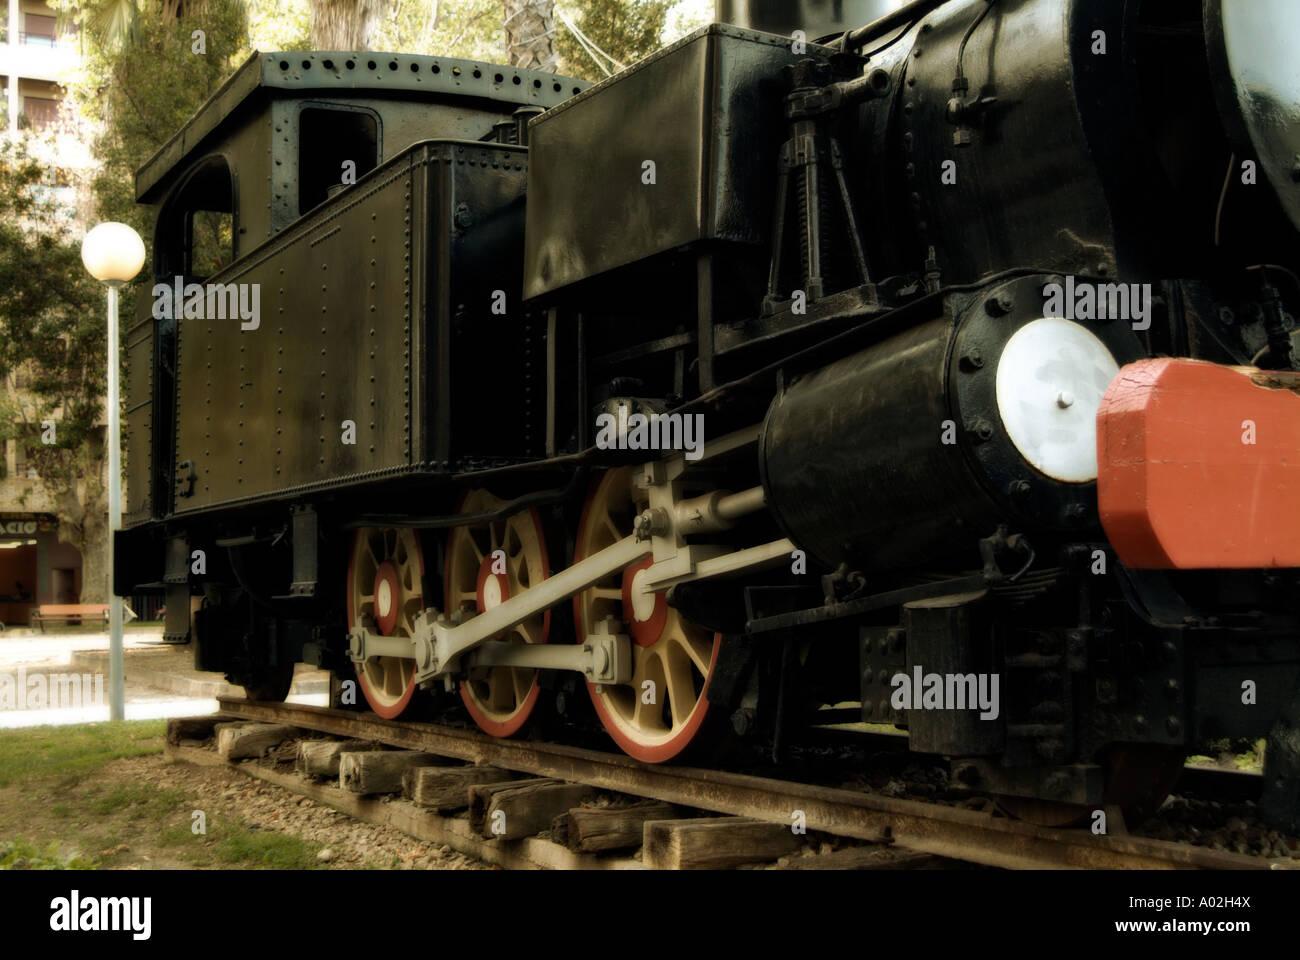 Cocentaina old steam locomotive. Gandia. La Safor district. Valencian Community. Spain - Stock Image